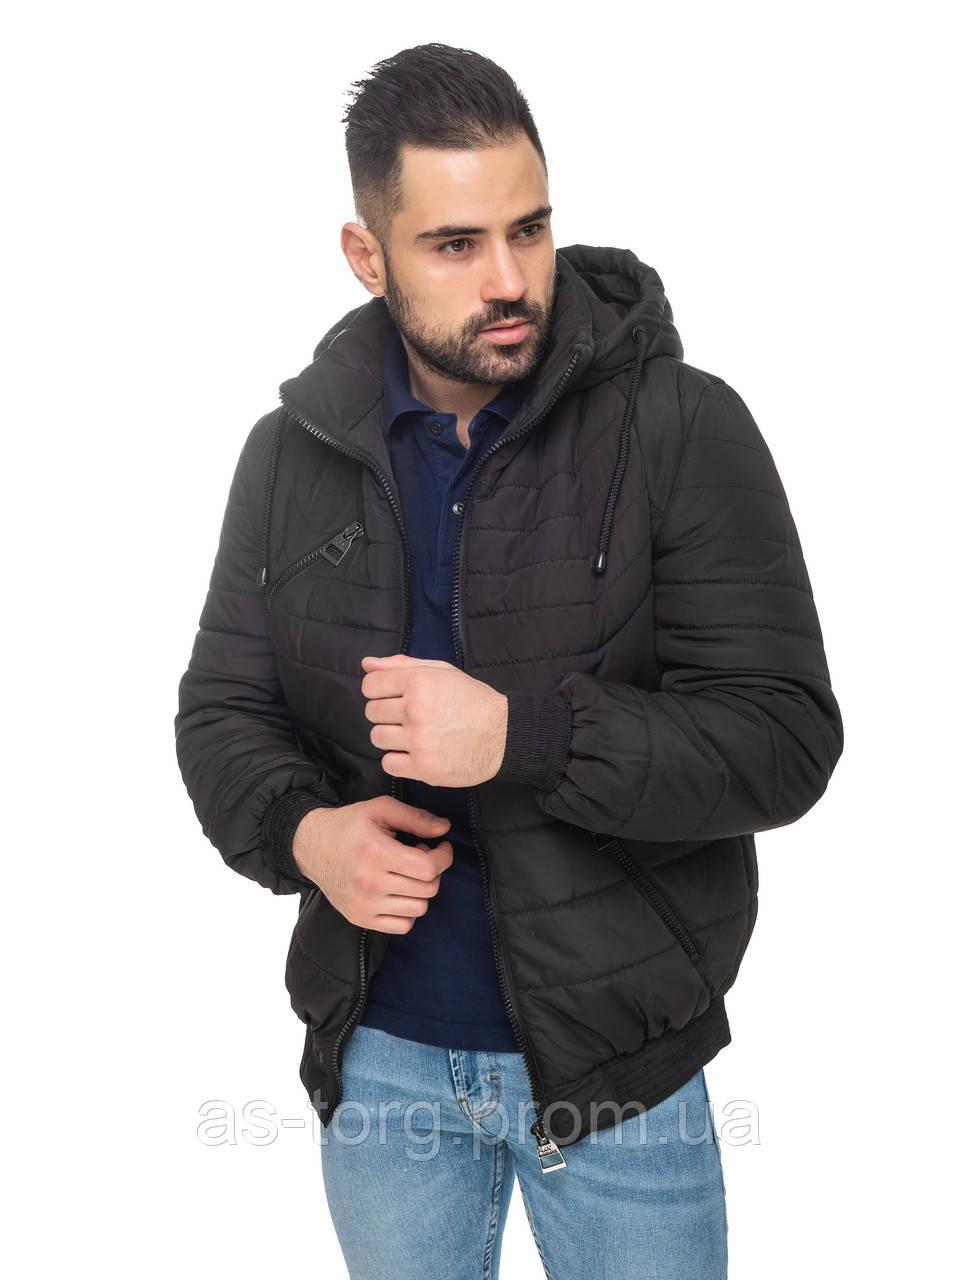 Короткая куртка Архип Черный Размер 48